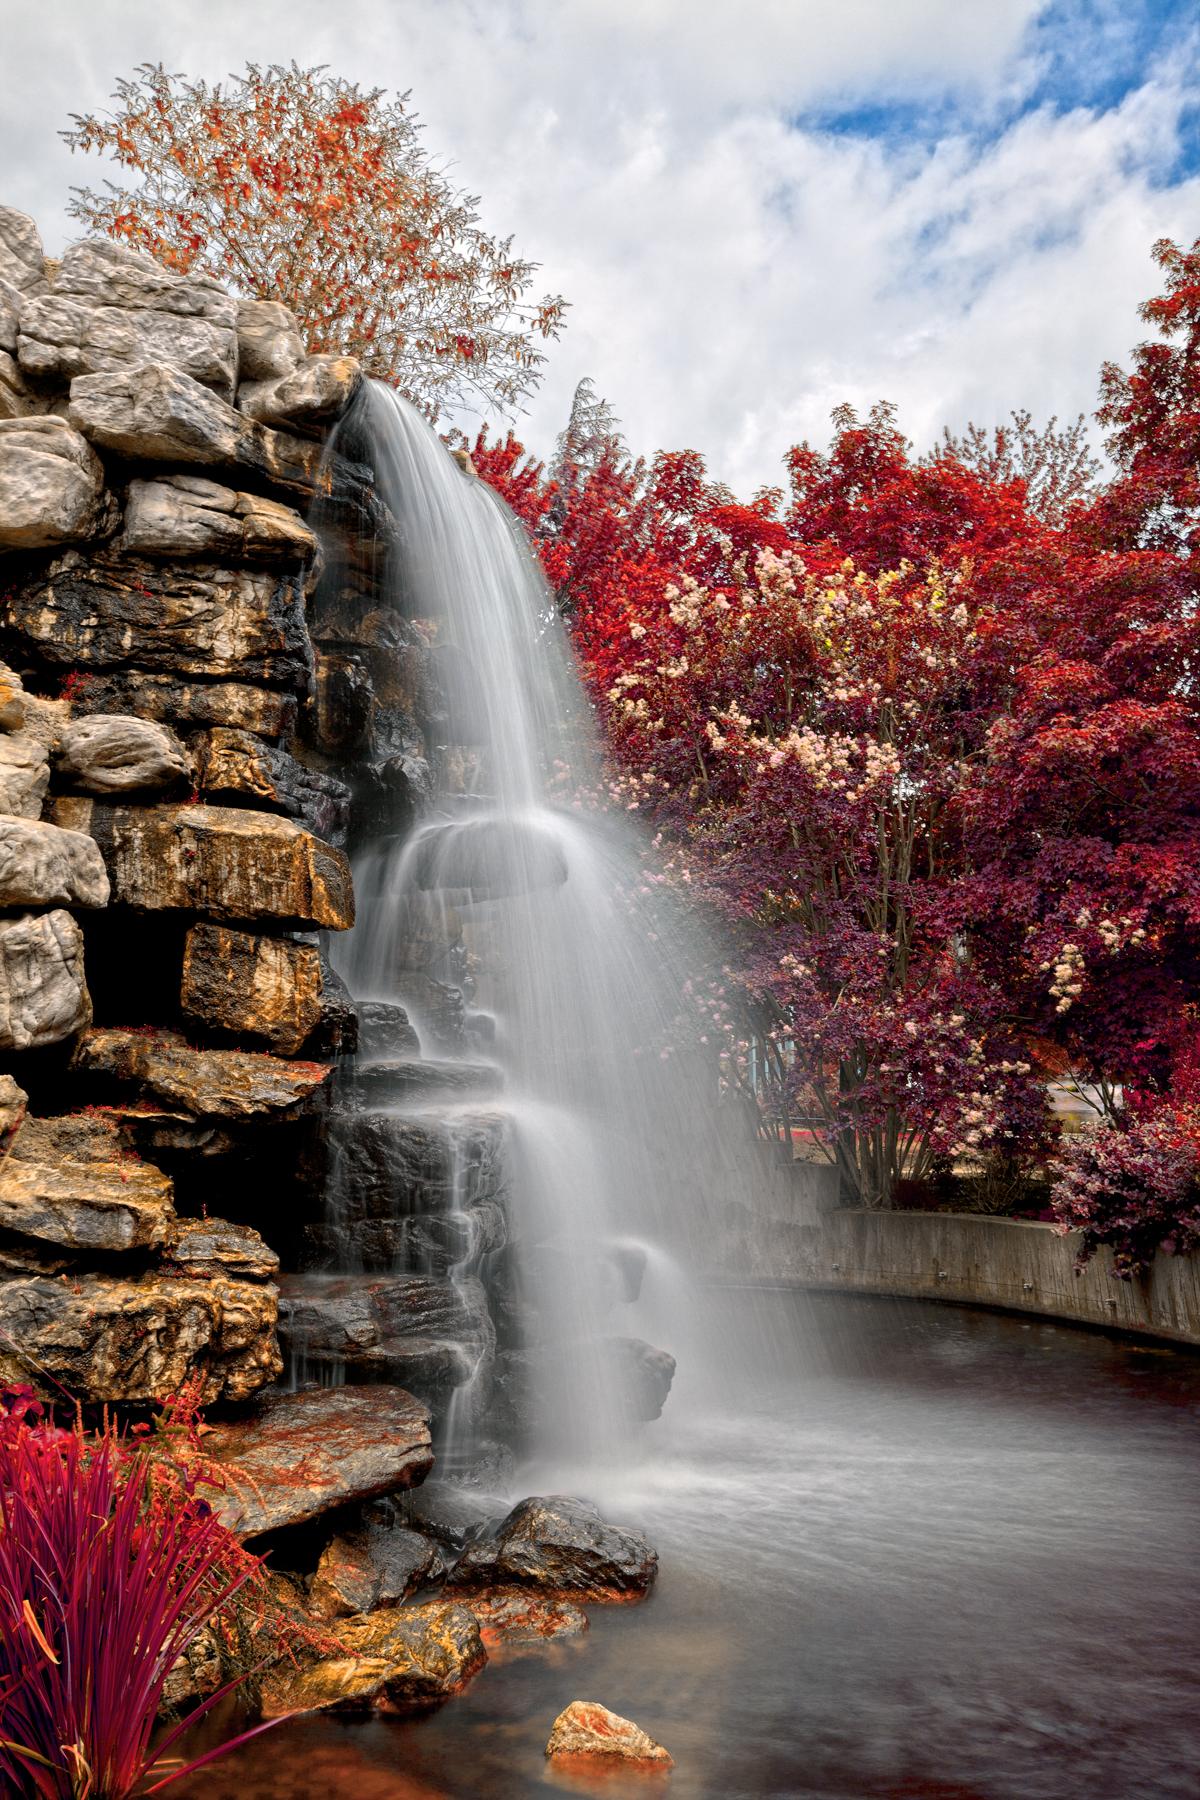 Zoo waterfall - autumn warm hdr photo